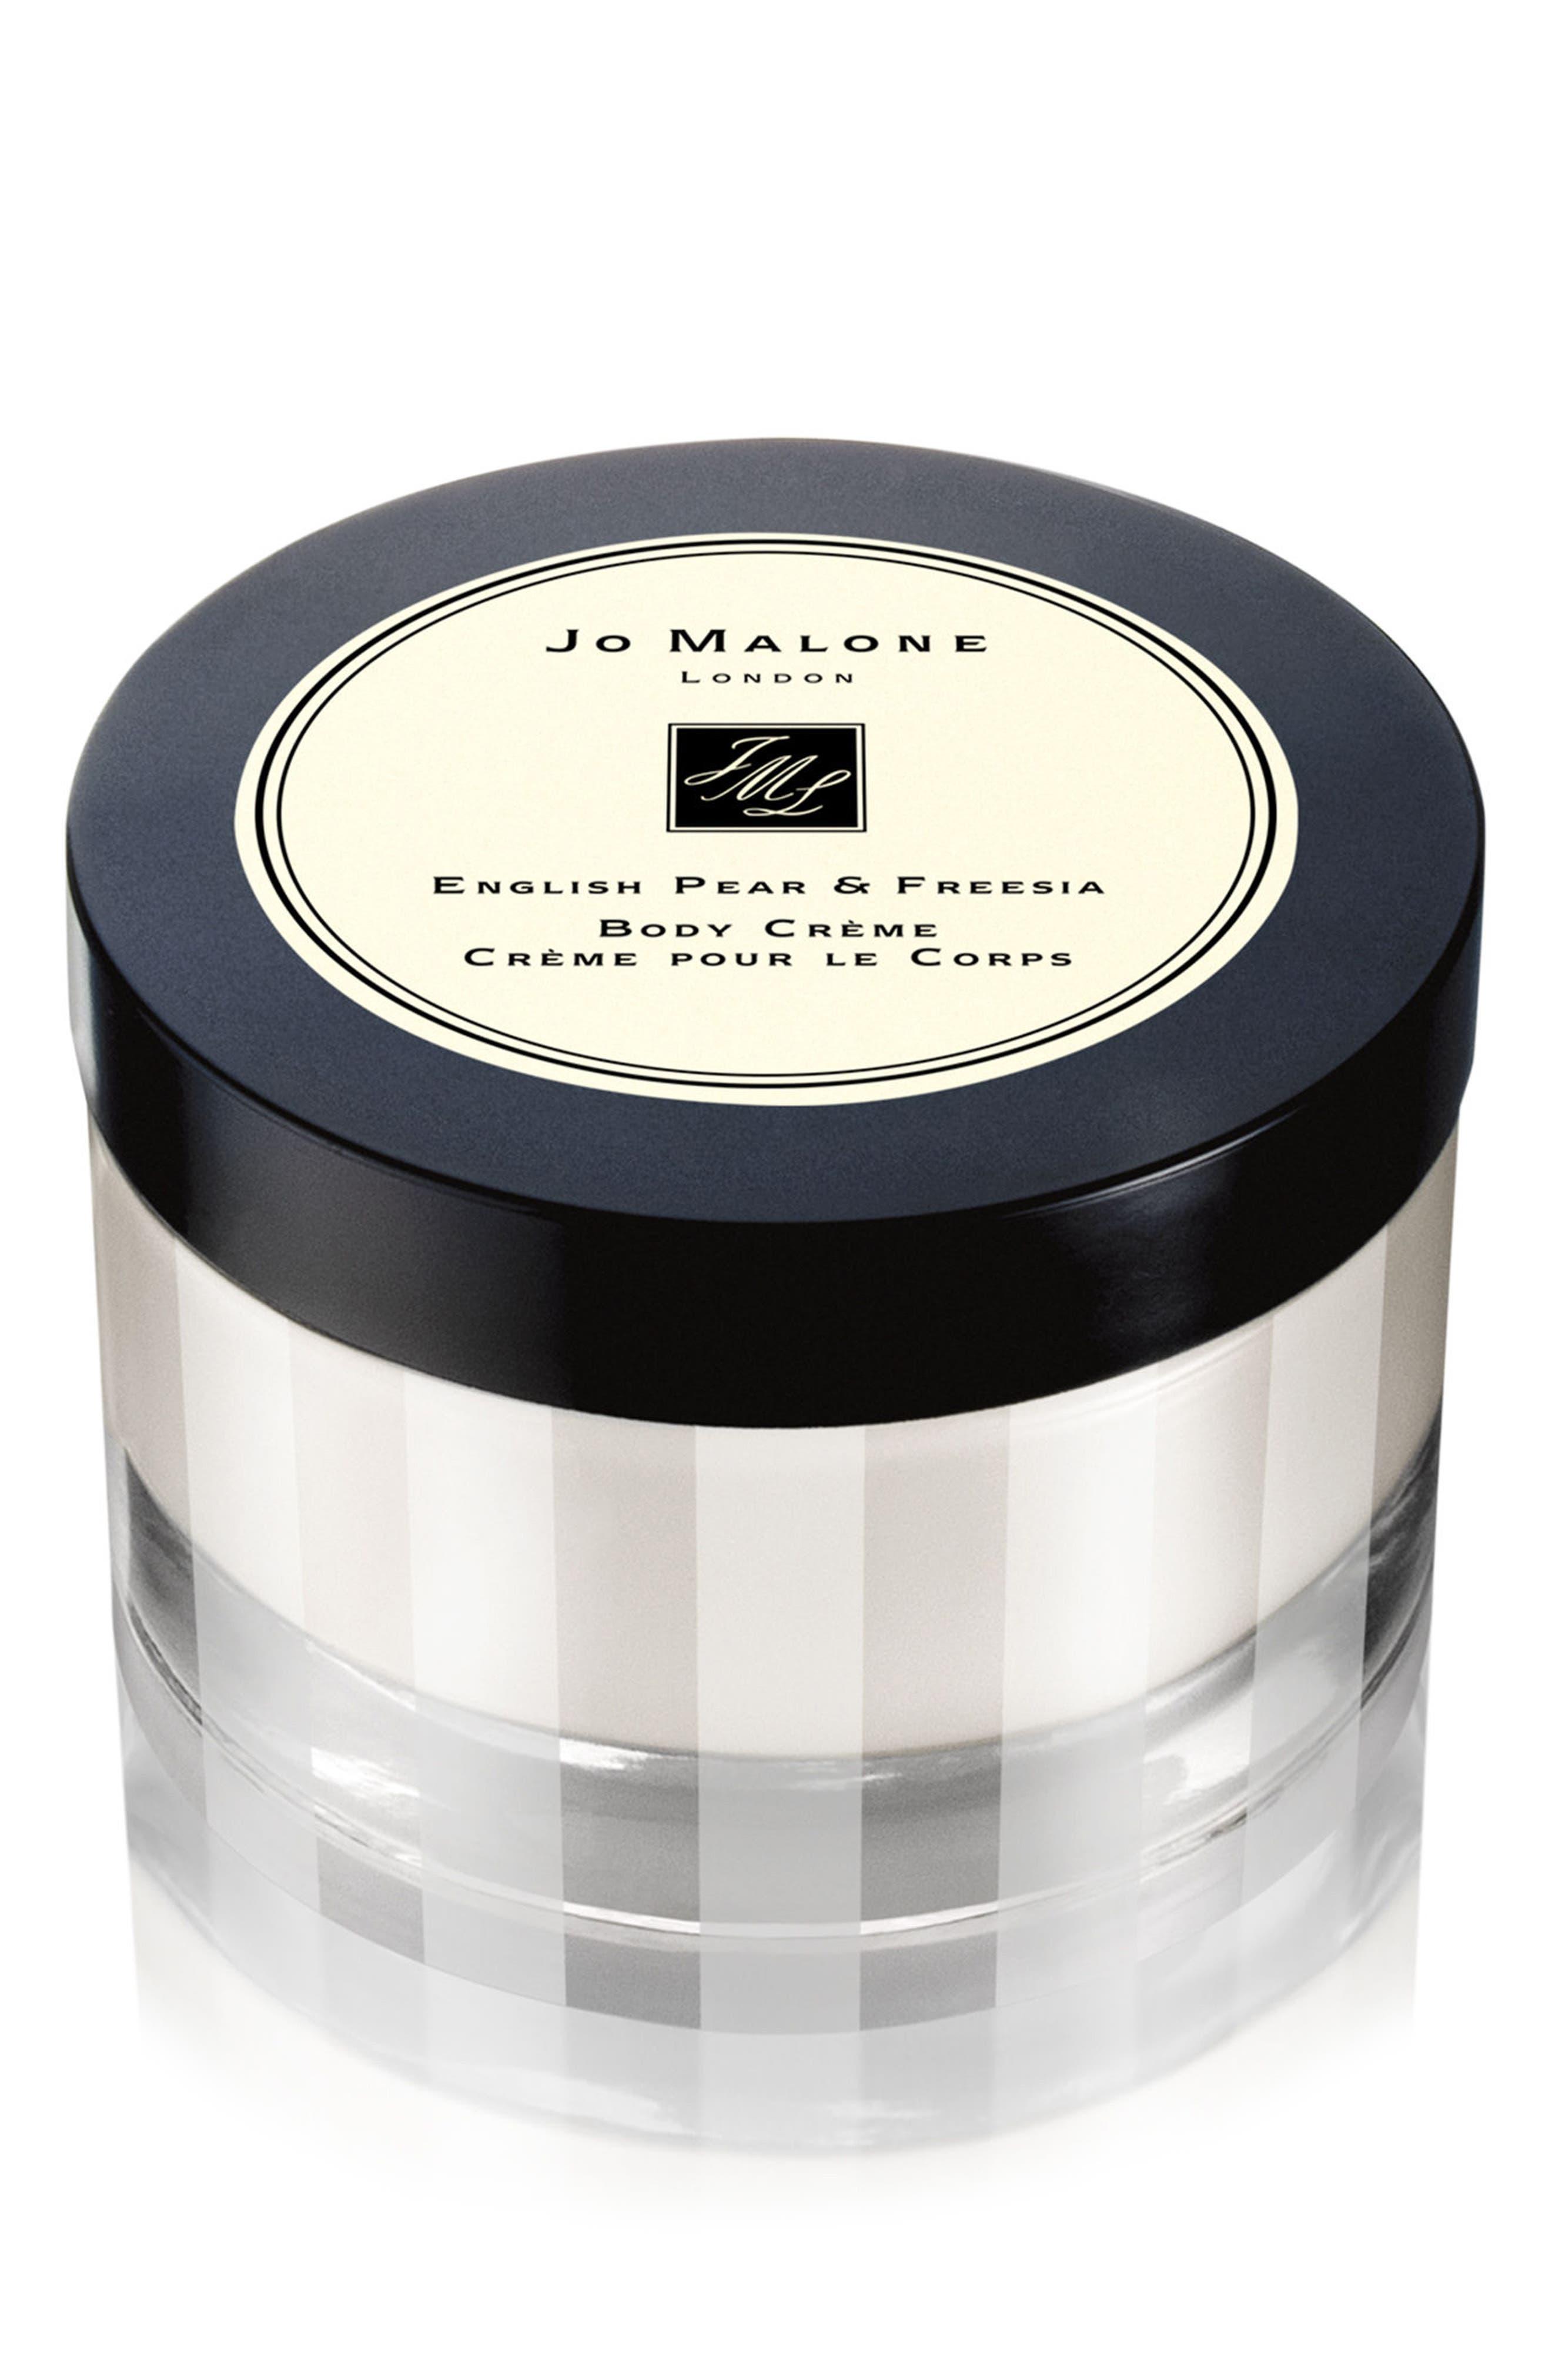 Main Image - Jo Malone London™ English Pear & Freesia Body Crème